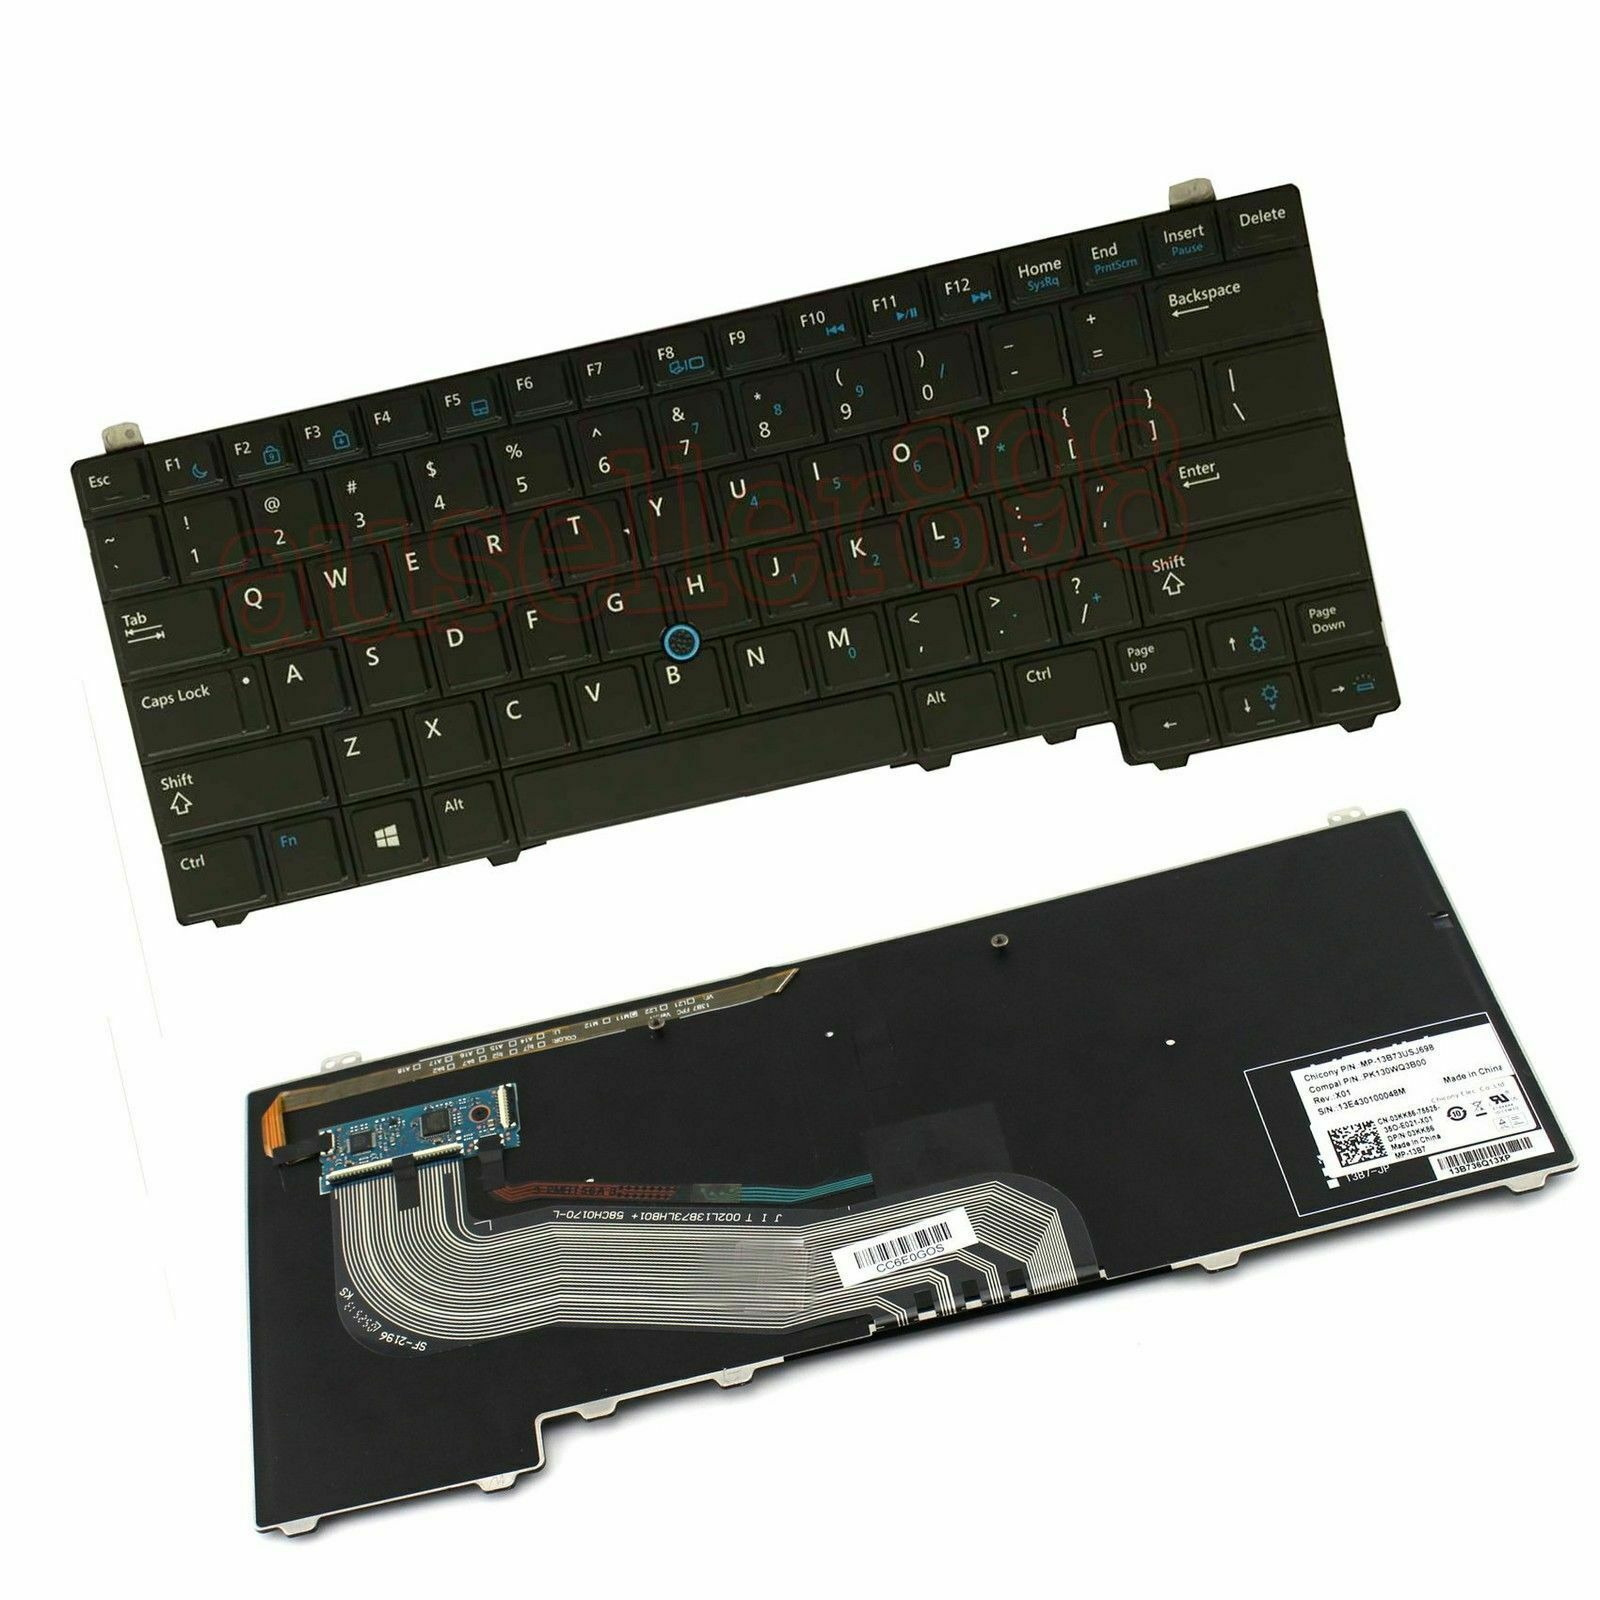 NEW FOR DELL Latitude E5440 Keyboard Backlit Pointer Swedish Tangentbord